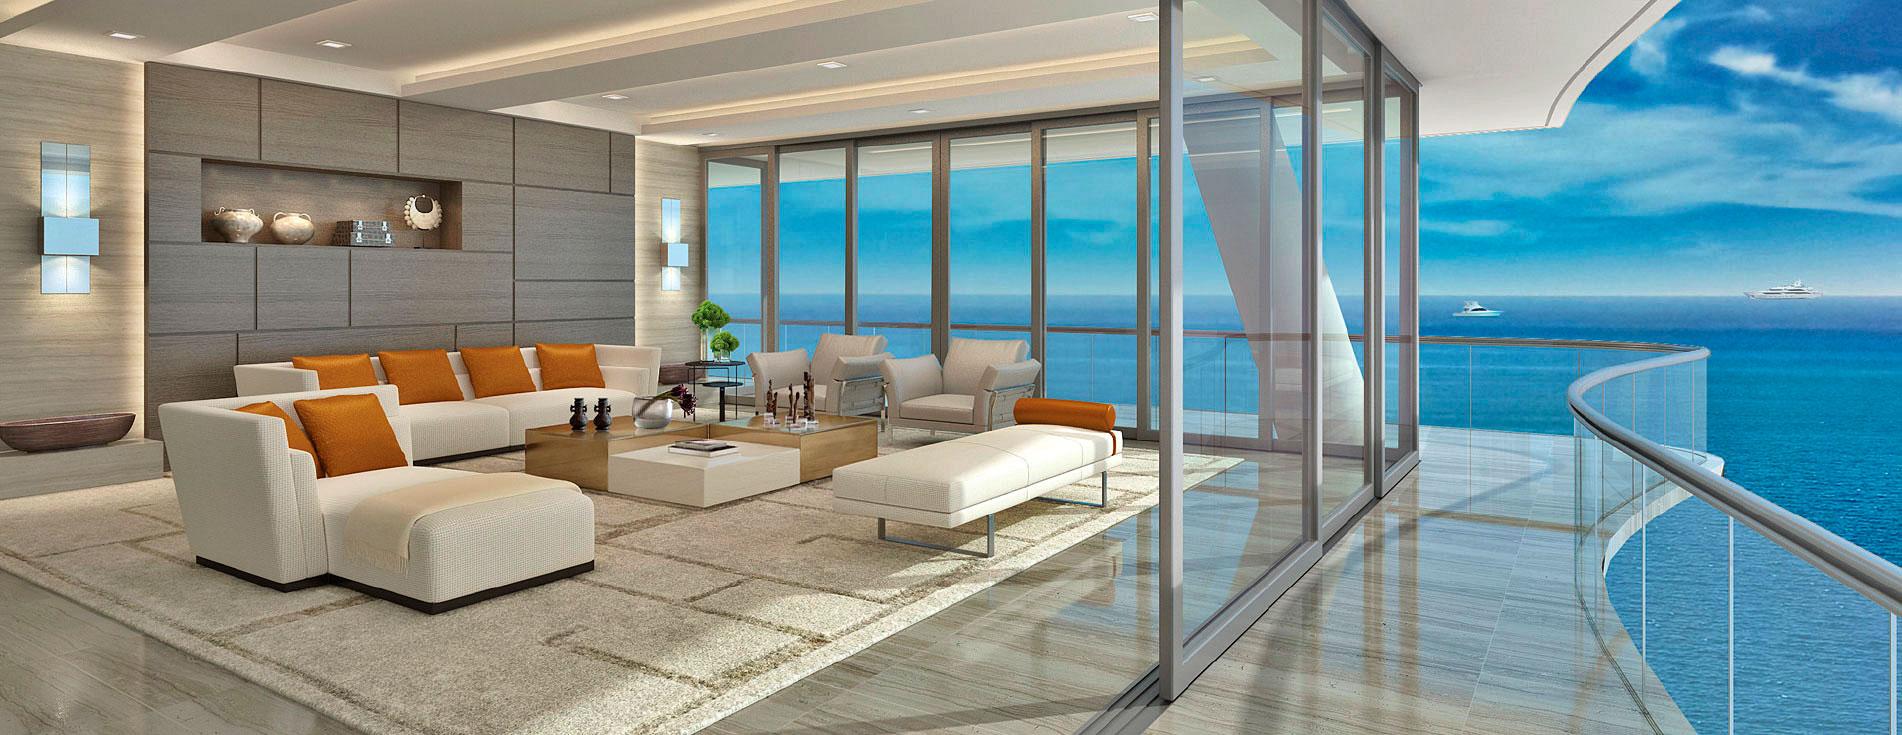 Official FENDI Château Residences Miami - Surfside-Bal Harbour